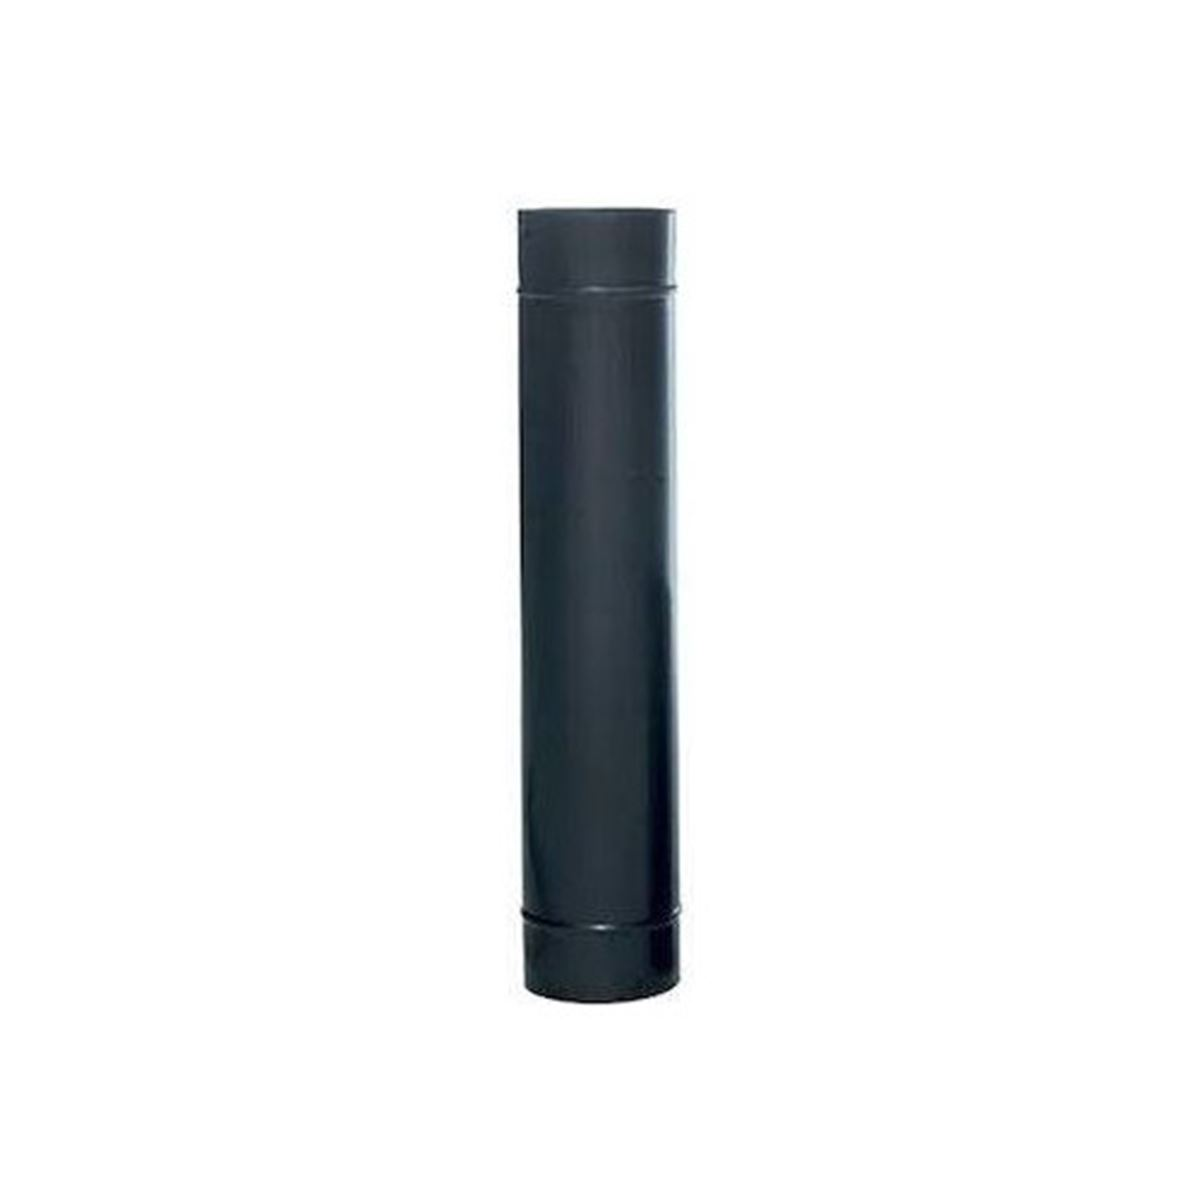 Mat Siyah Soba Borusu 25 Cm Uzunluk